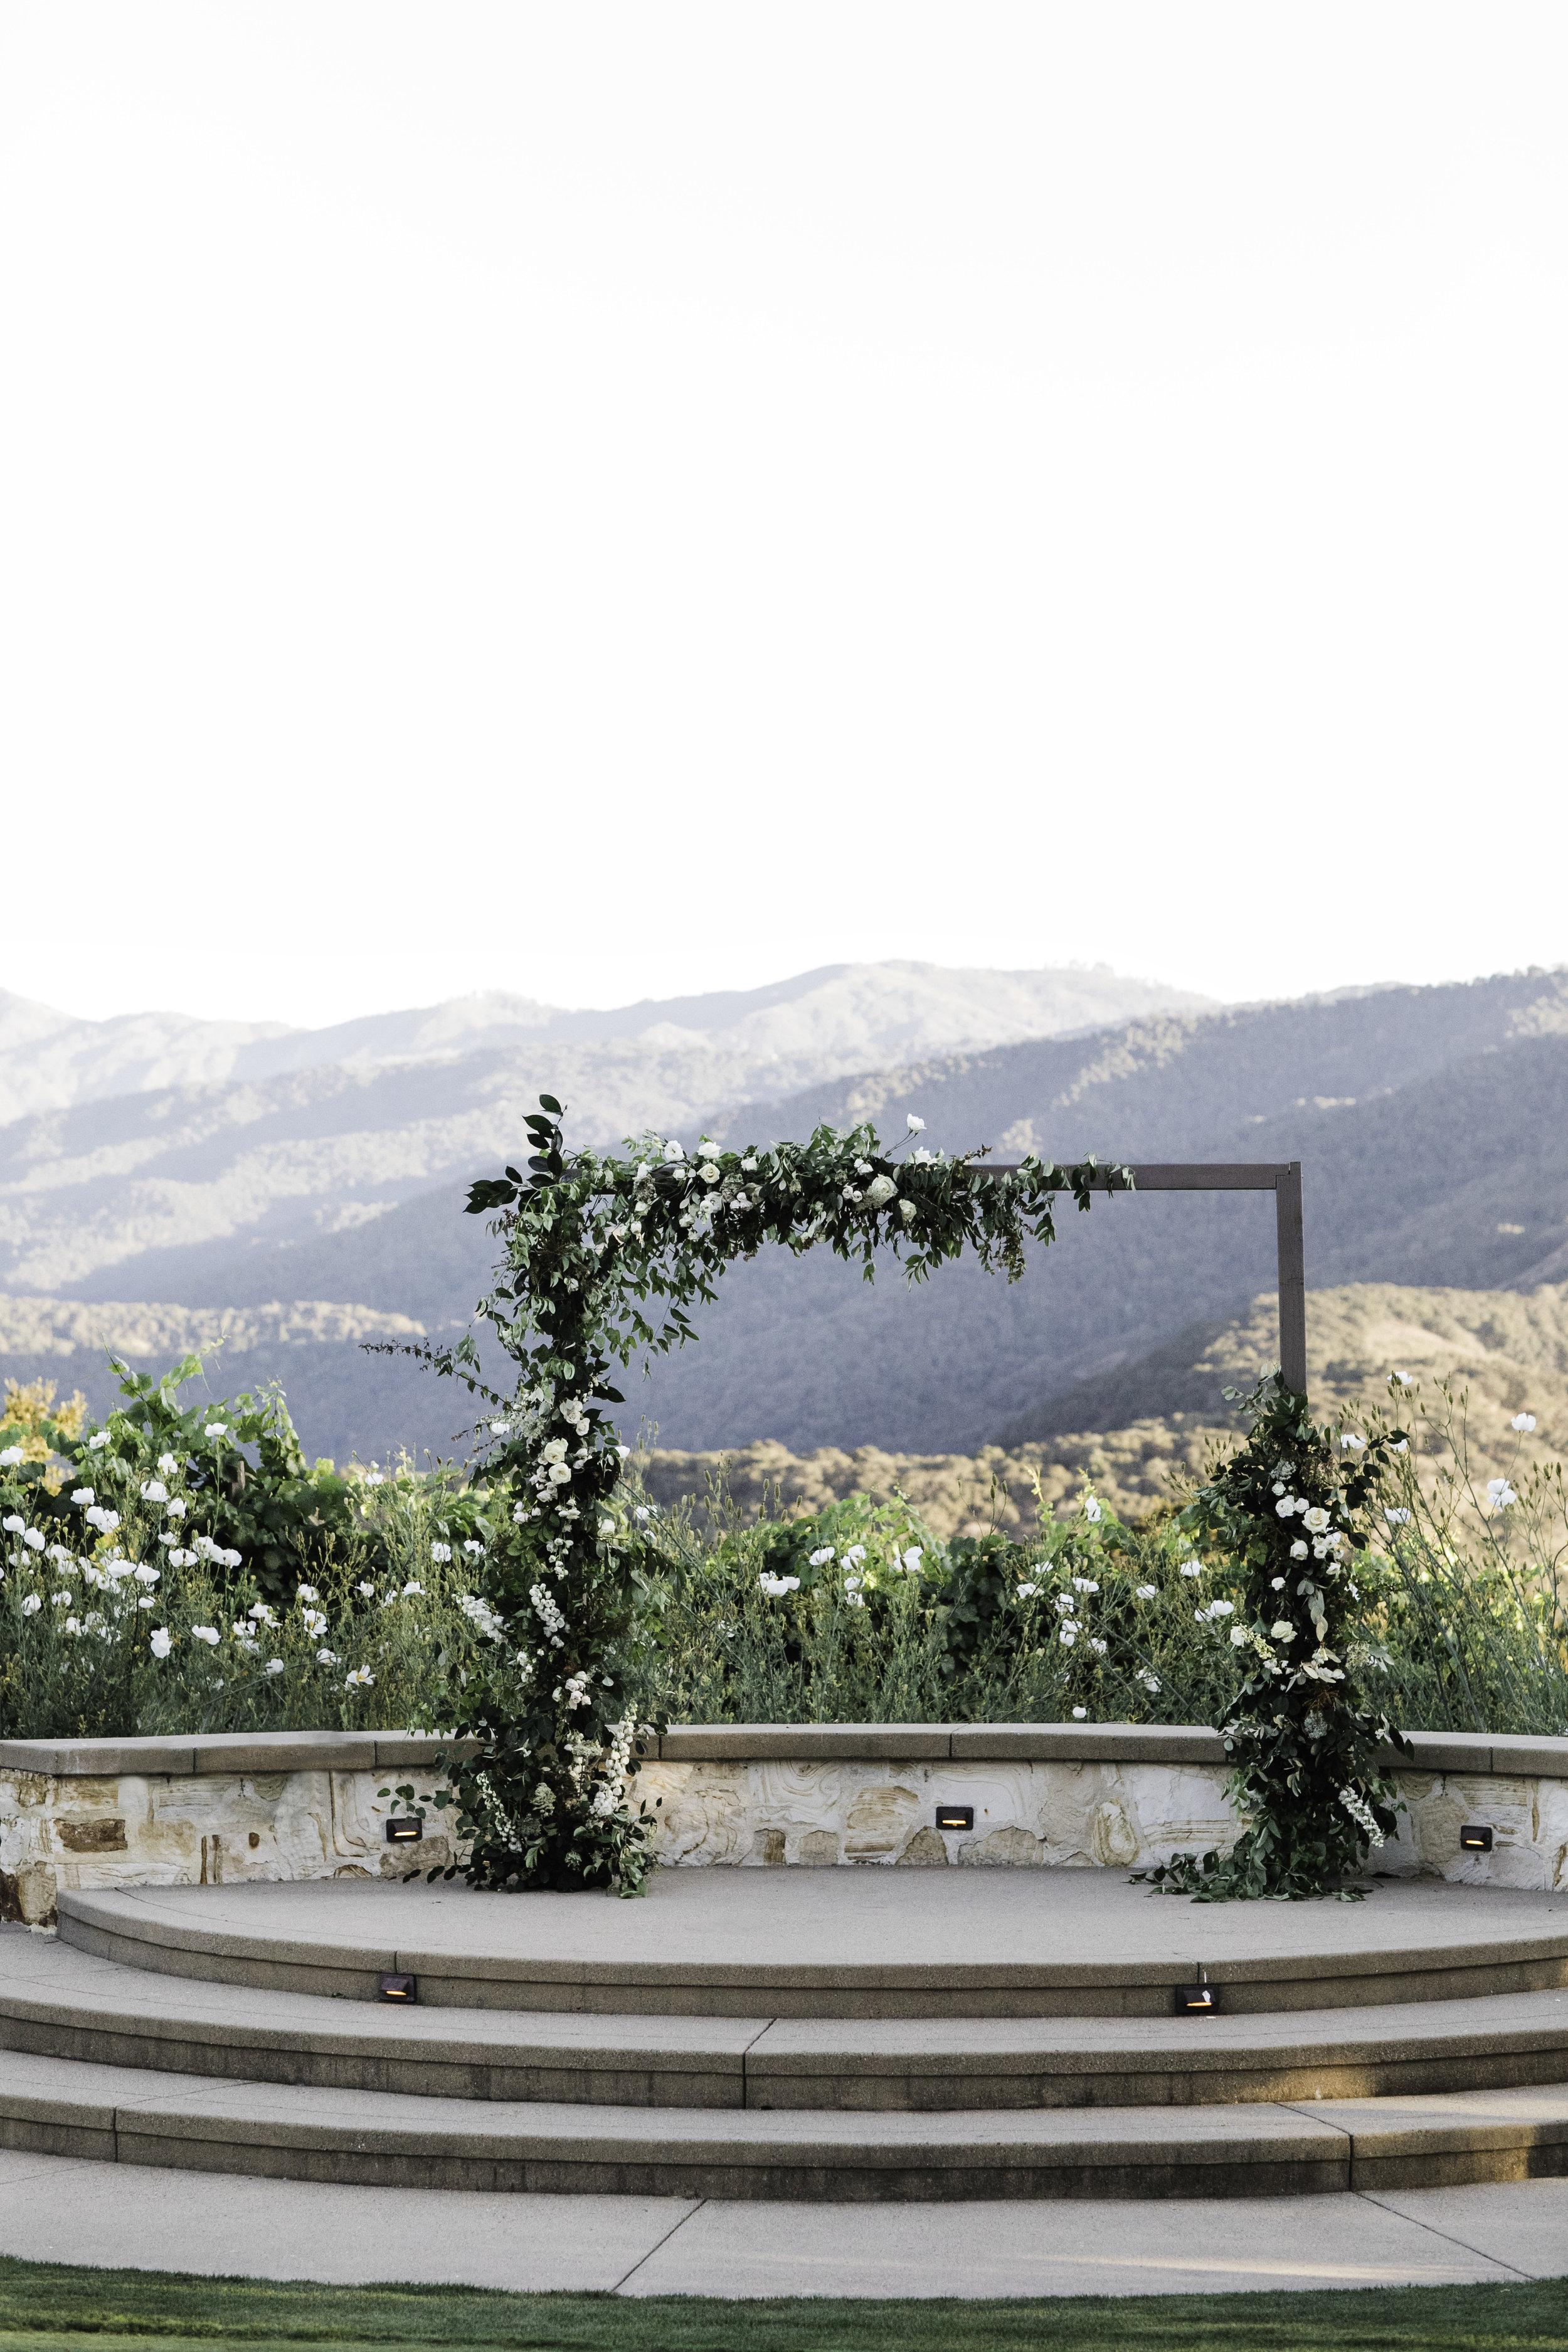 072118_D+K_Holman Ranch Wedding_Buena Lane Photography_1312ER.jpg